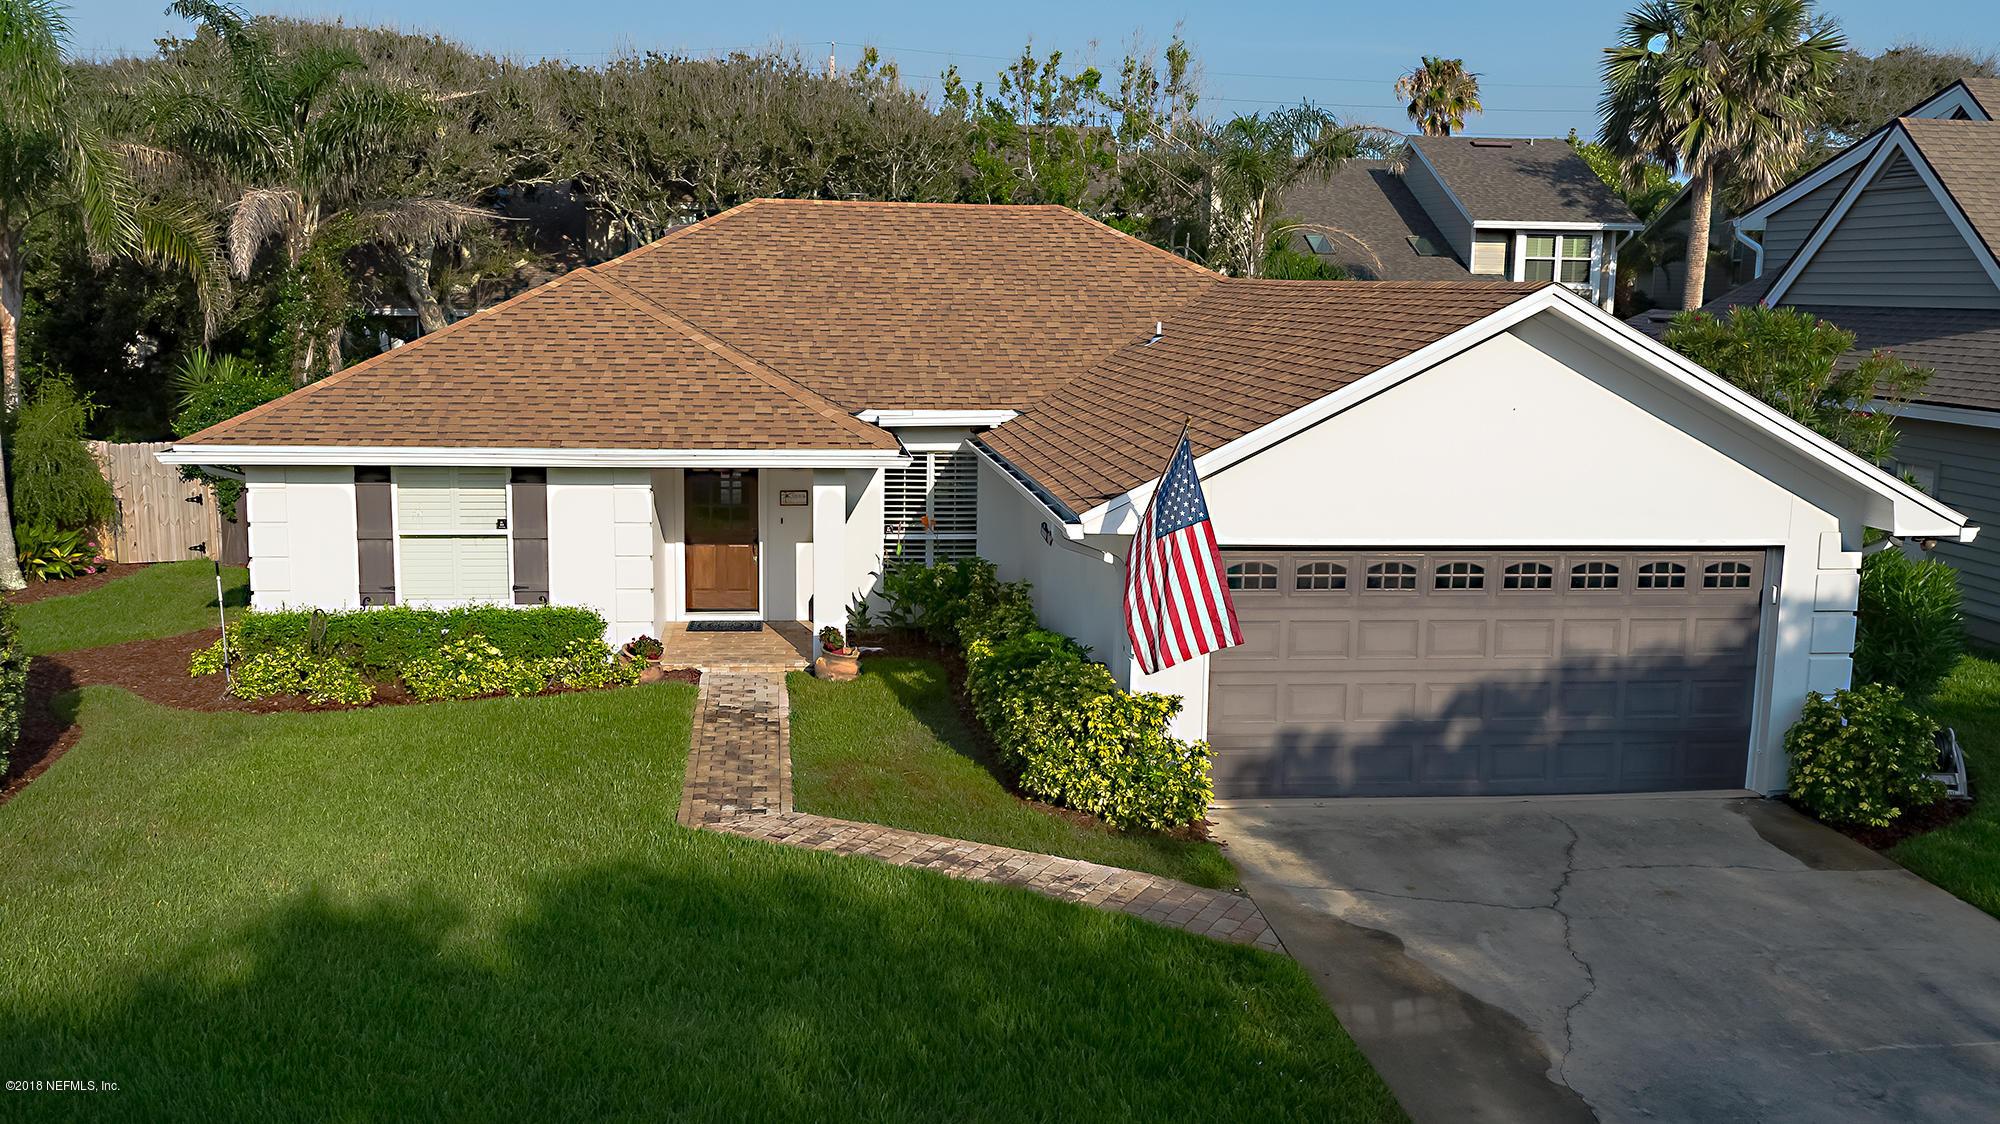 1864 BEACHSIDE, ATLANTIC BEACH, FLORIDA 32233, 3 Bedrooms Bedrooms, ,2 BathroomsBathrooms,Residential - single family,For sale,BEACHSIDE,942252